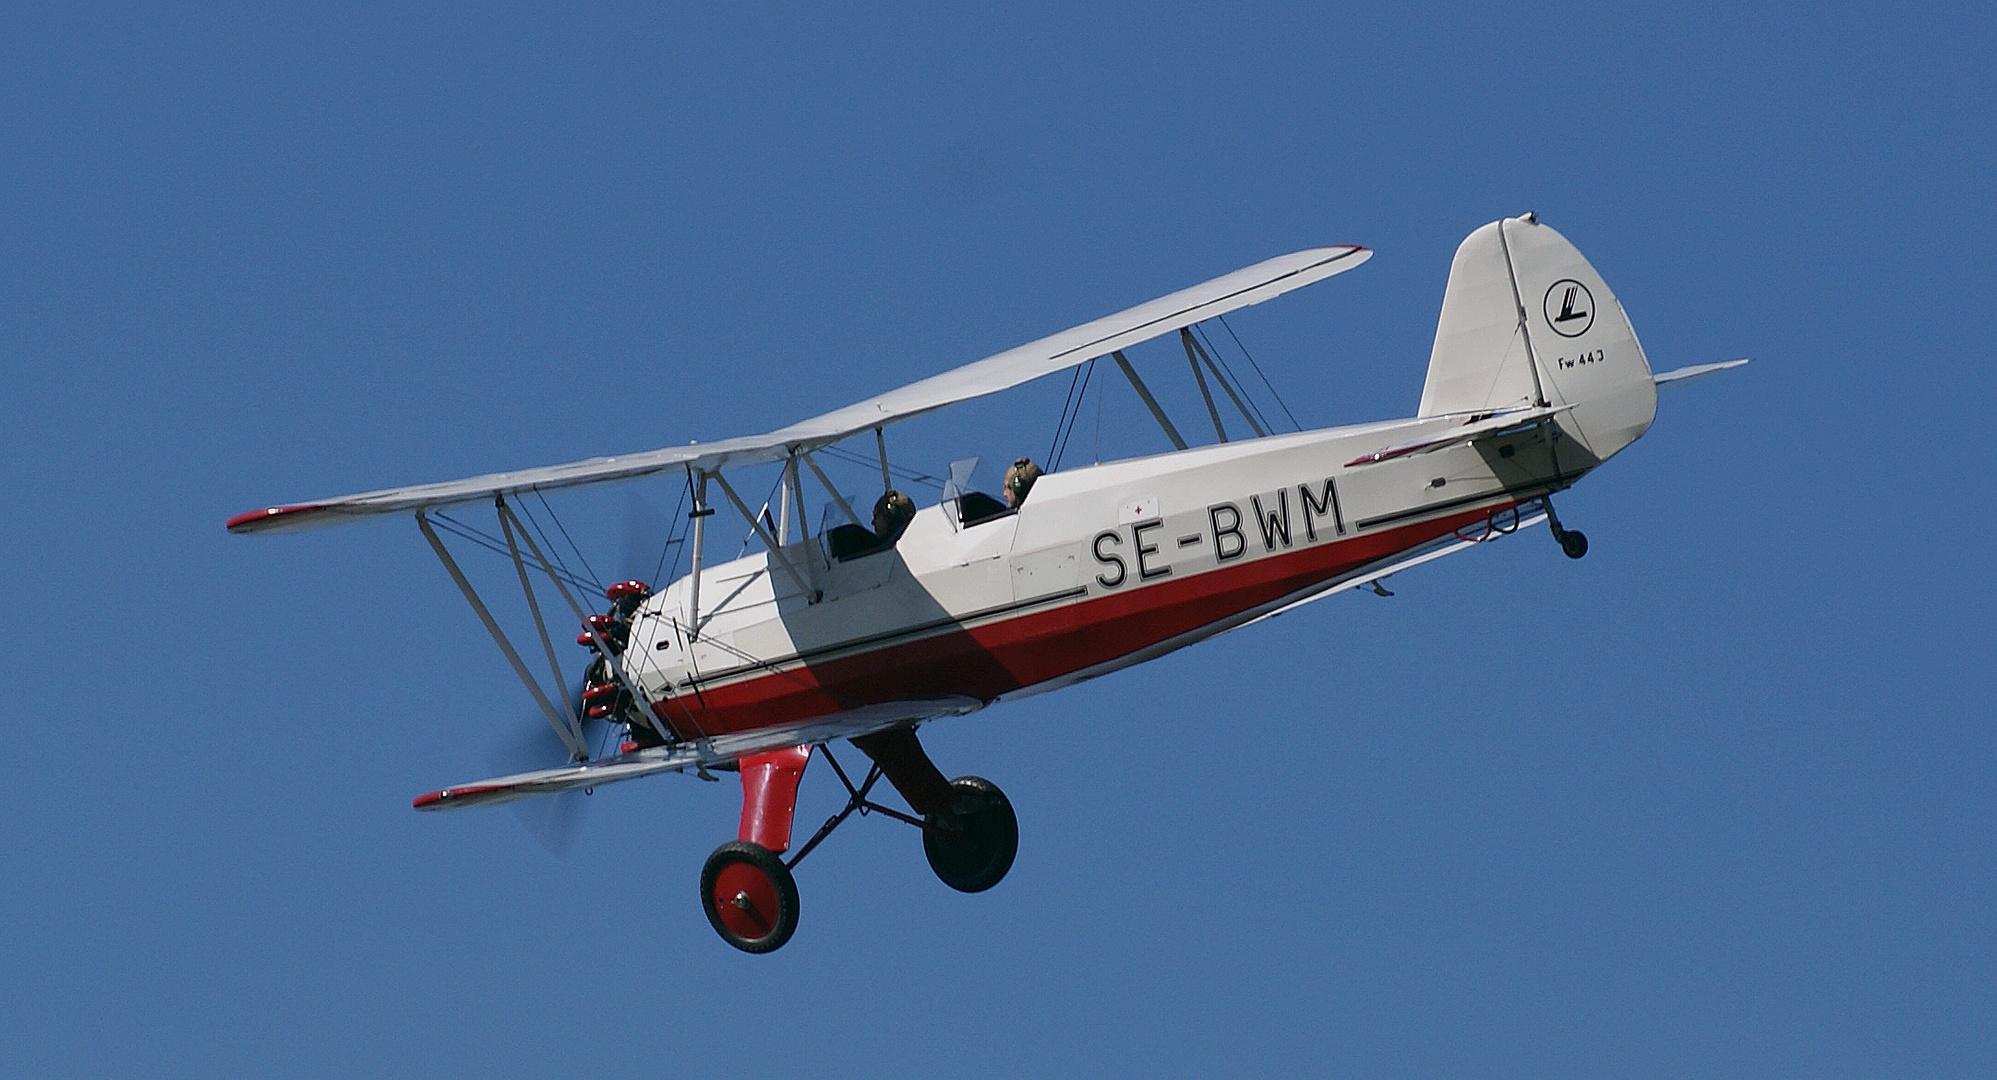 Focke Wulf,FW 44J Stieglitz / SE-BWM